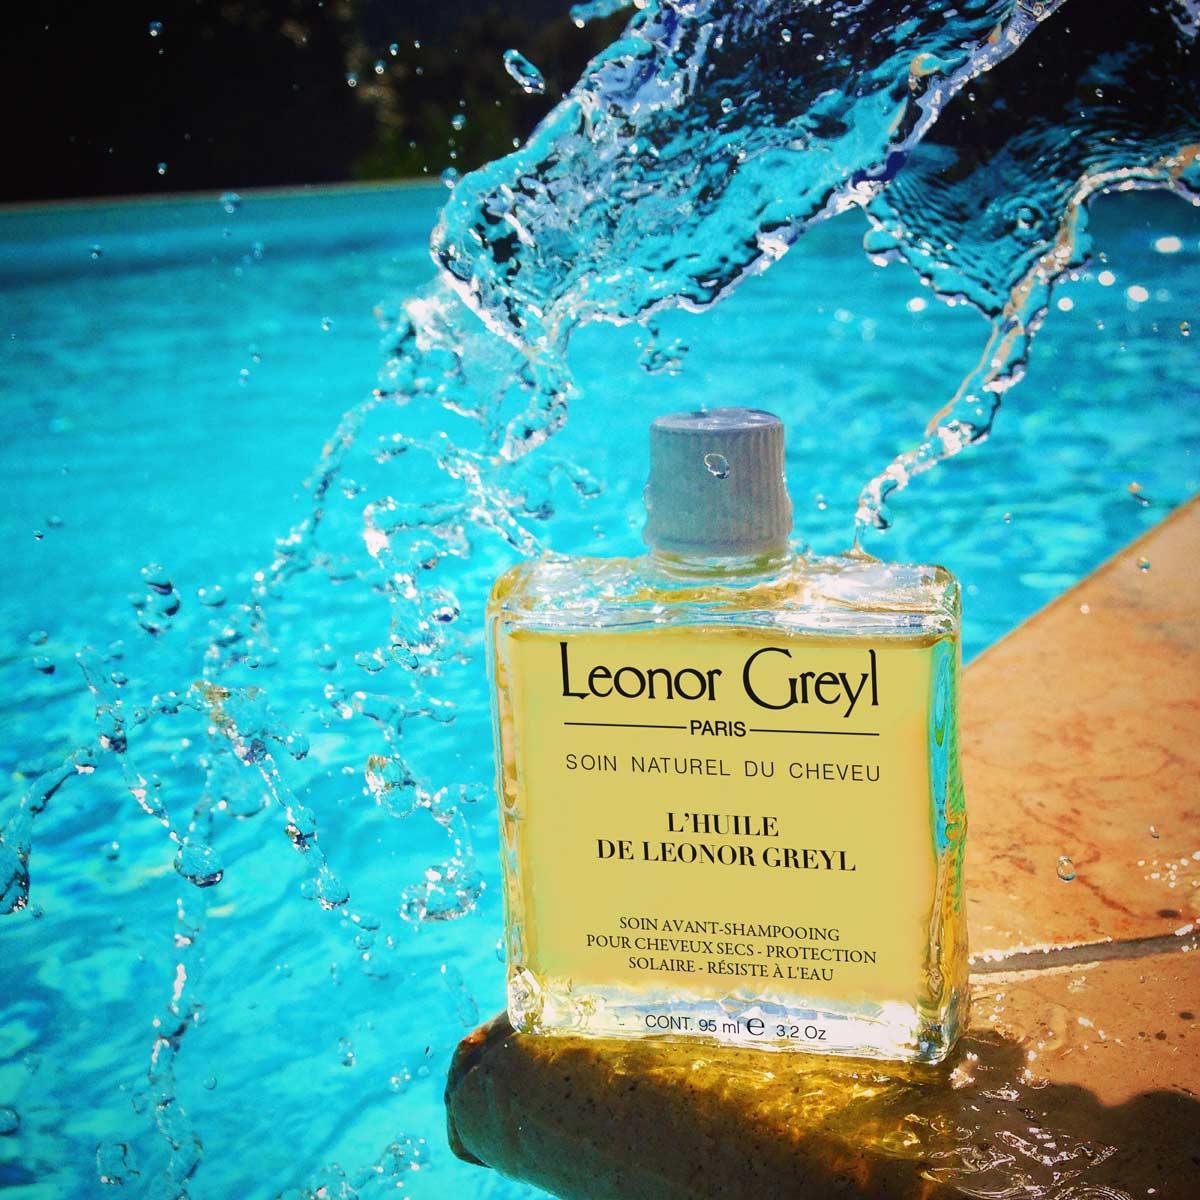 l'huile de leonor greyl next to pool